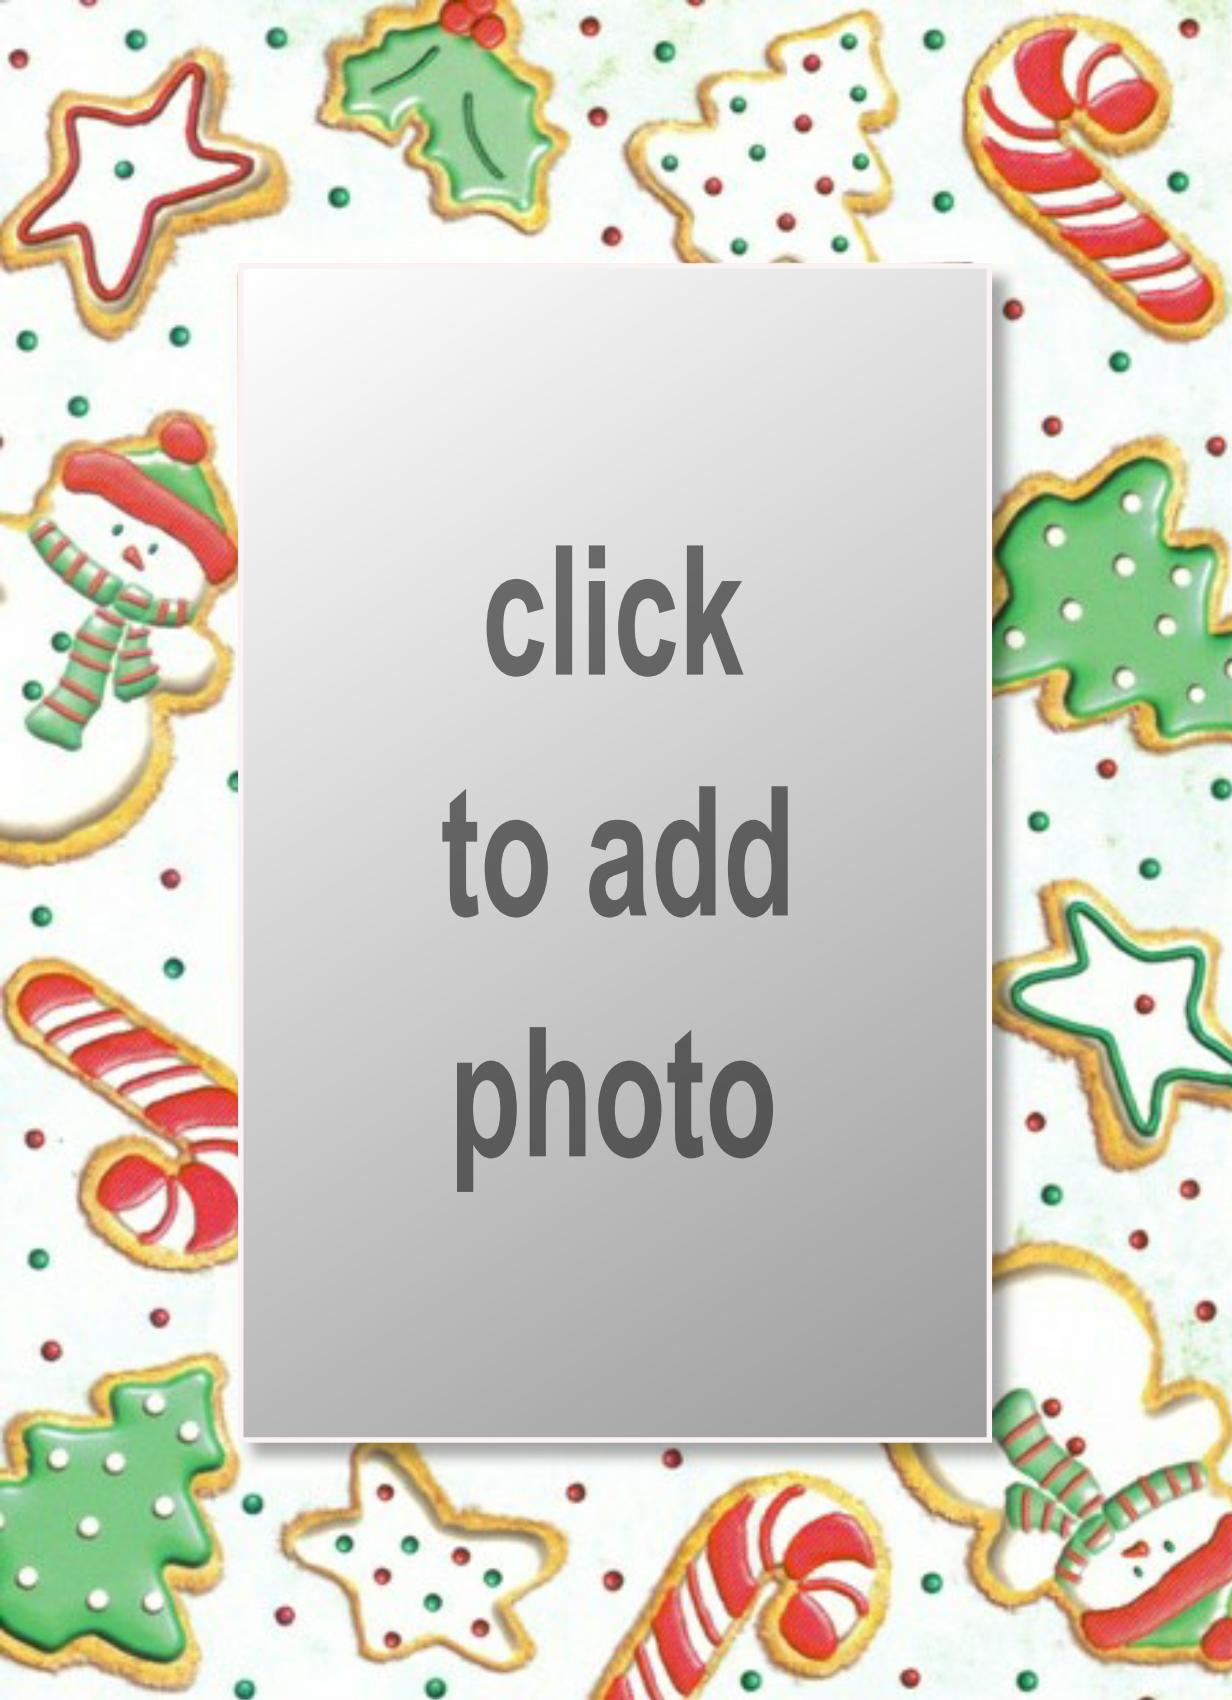 Angelbaby_2978\'s Christma Frames - 2008 November - #Christmas Cookie ...